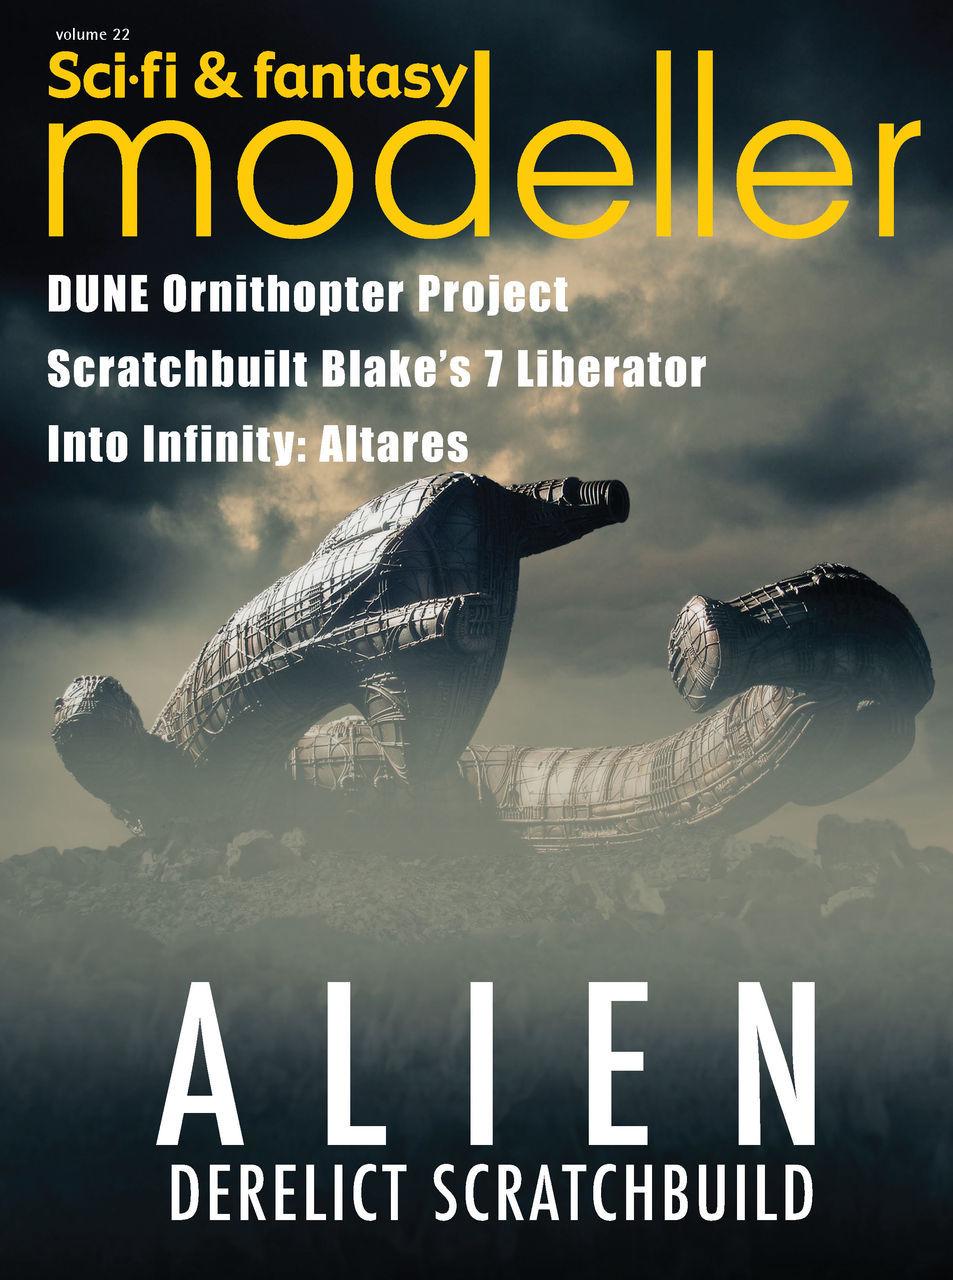 sci-fi-fantasy-modeller-22-book.jpg